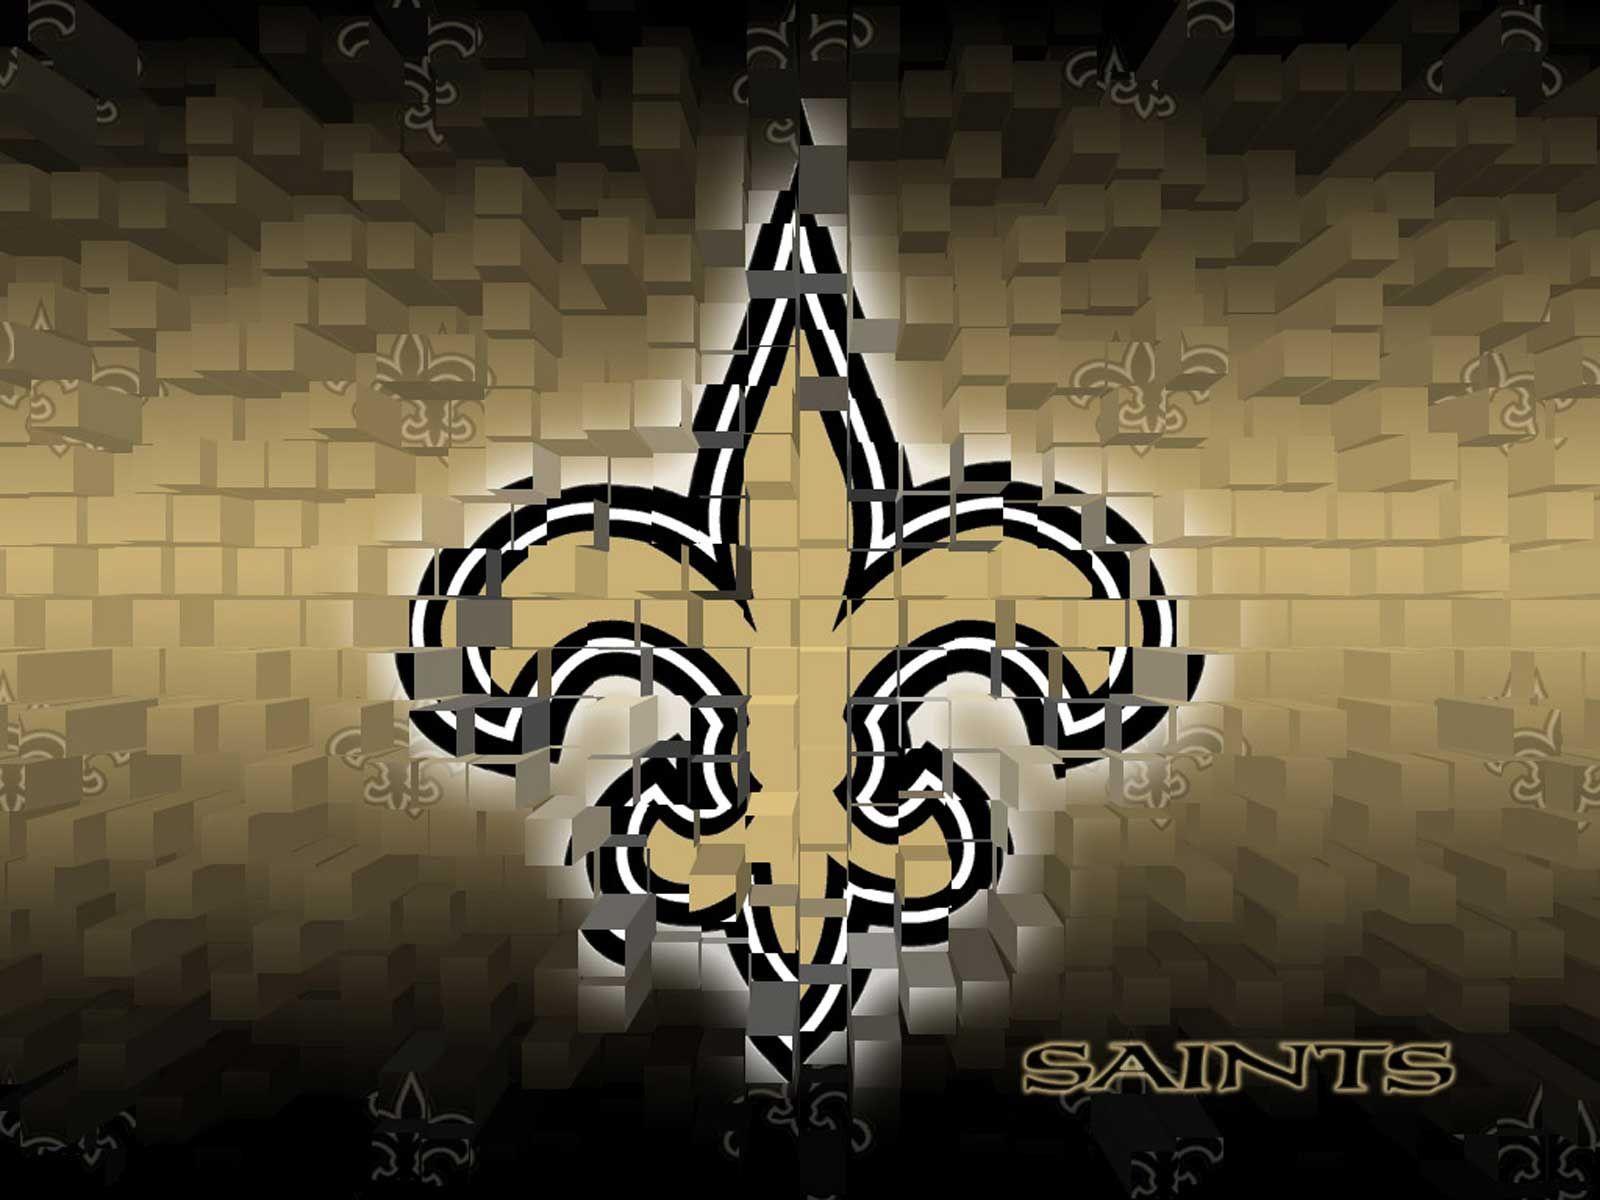 Saints Wallpaper 14511 14963 Hd Wallpapers Jpg New Orleans Saints Football Wallpaper Saints Football